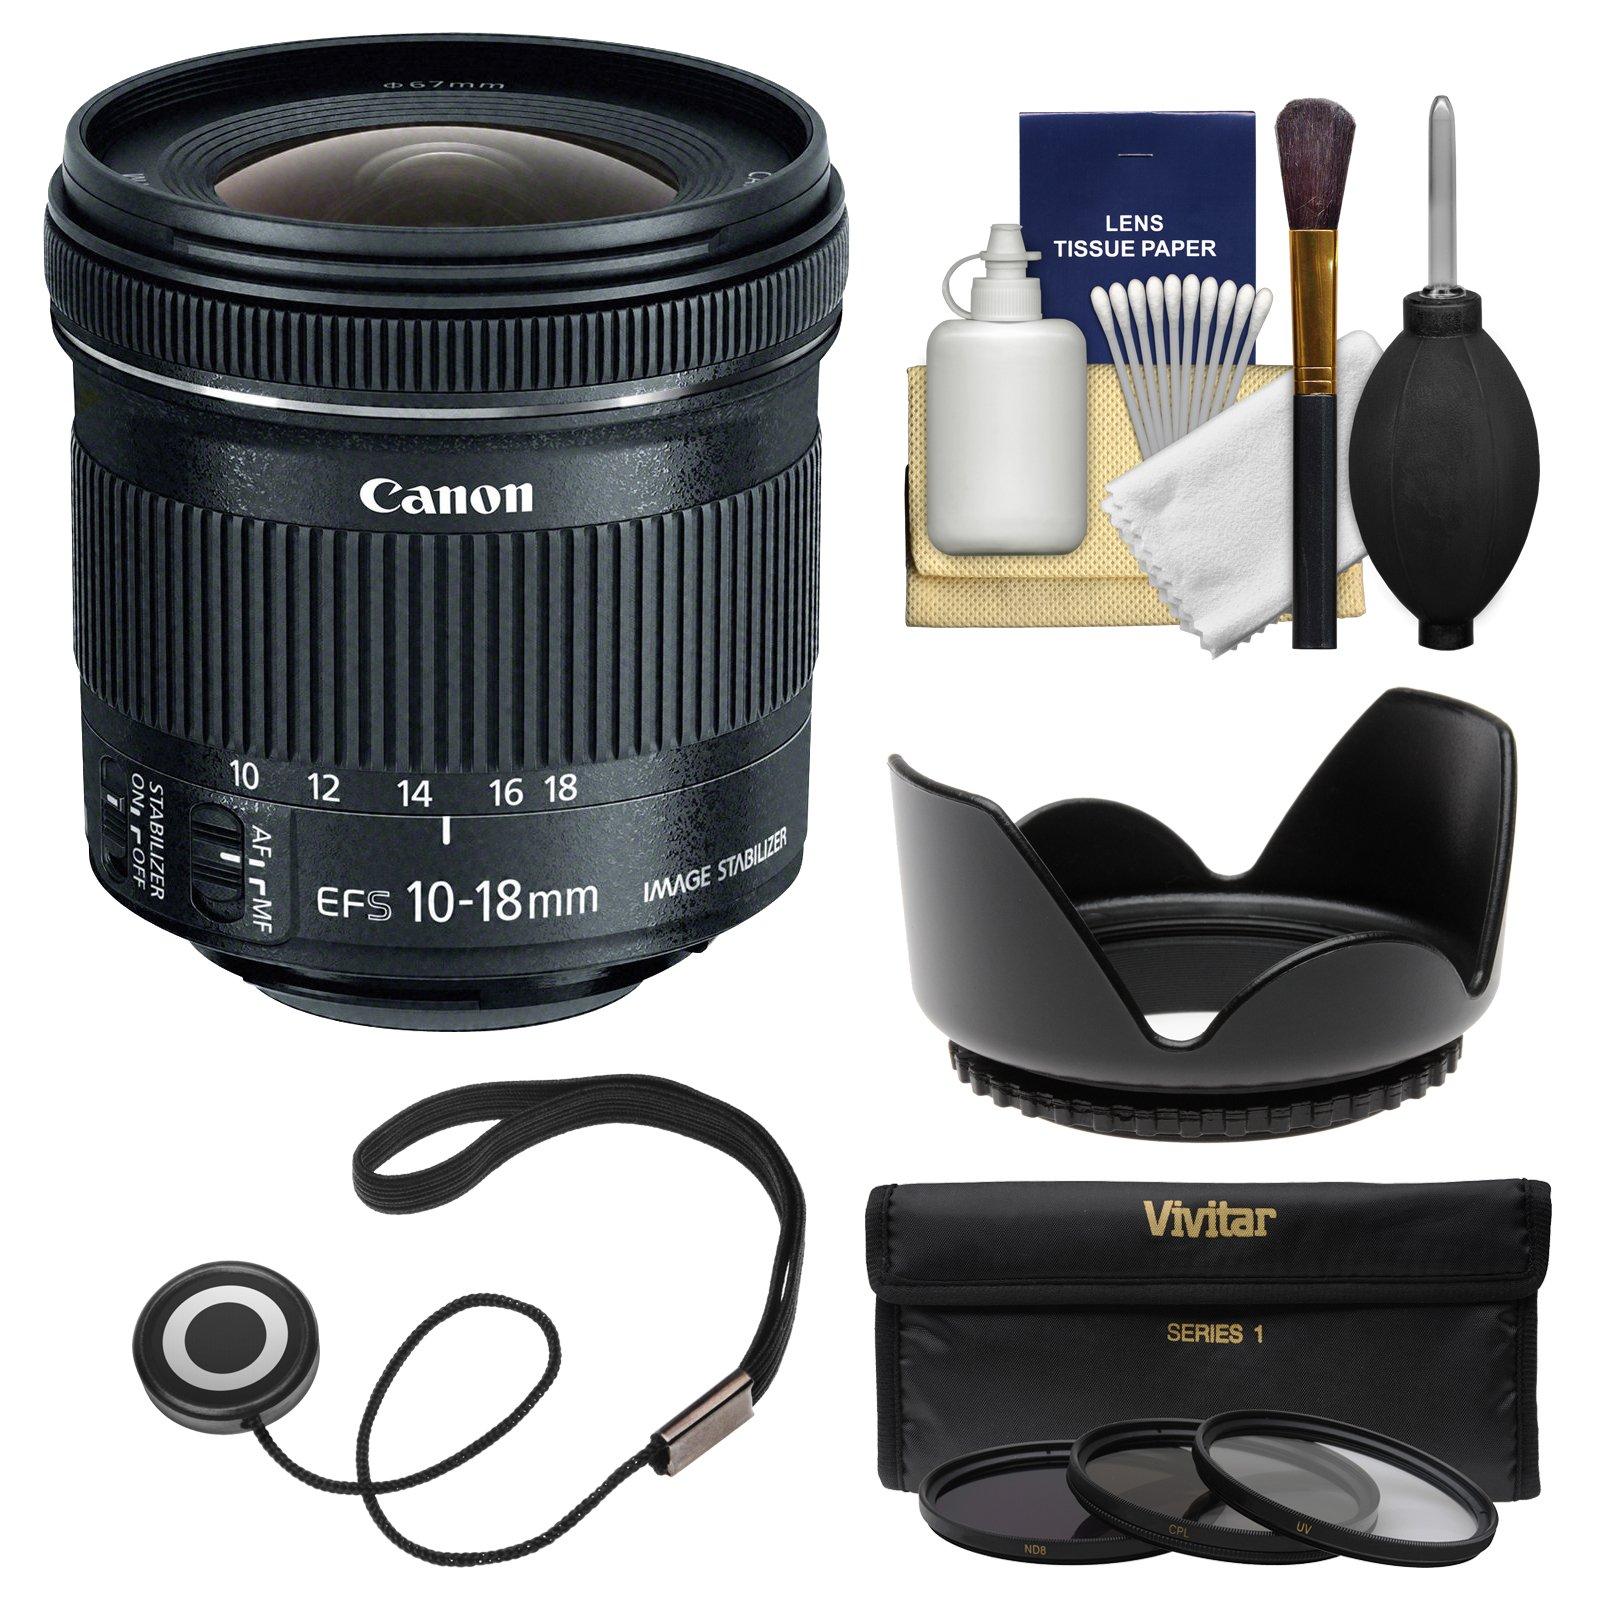 Canon EF-S 10-18mm f/4.5-5.6 is STM Zoom Lens with Hood + 3 UV/CPL/ND8 Filters + Kit for EOS 70D, 7D, Rebel T5, T5i, T6i, T6s, SL1 DSLR Camera